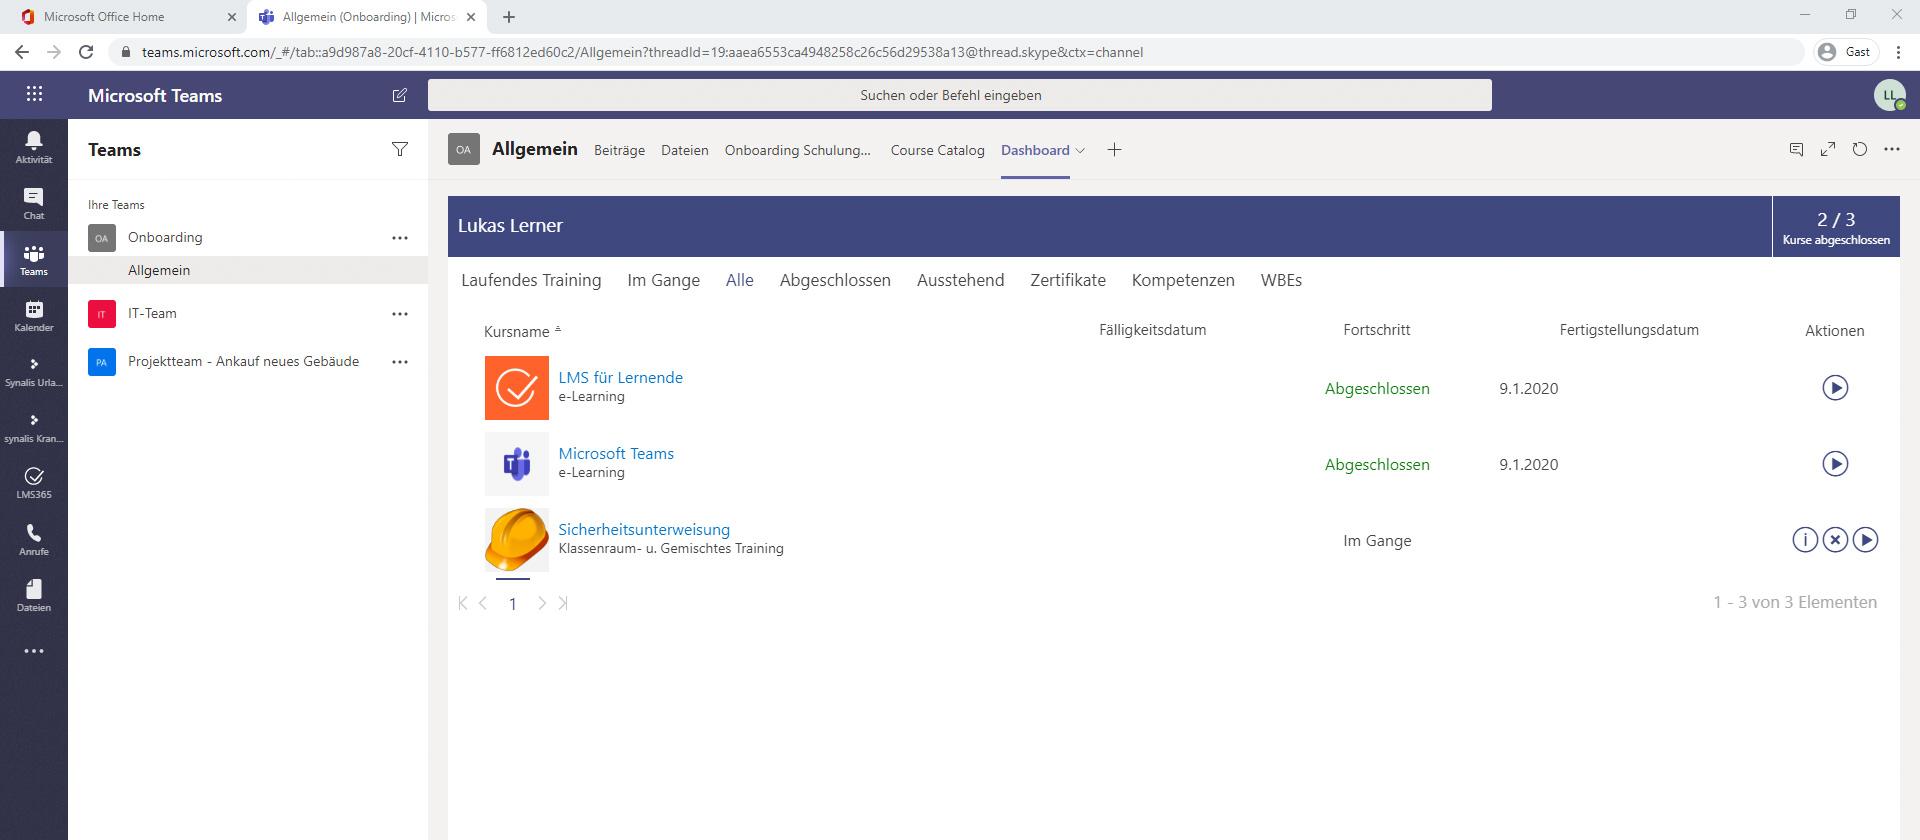 synalis Blogbeitrag MicrosoftTeams